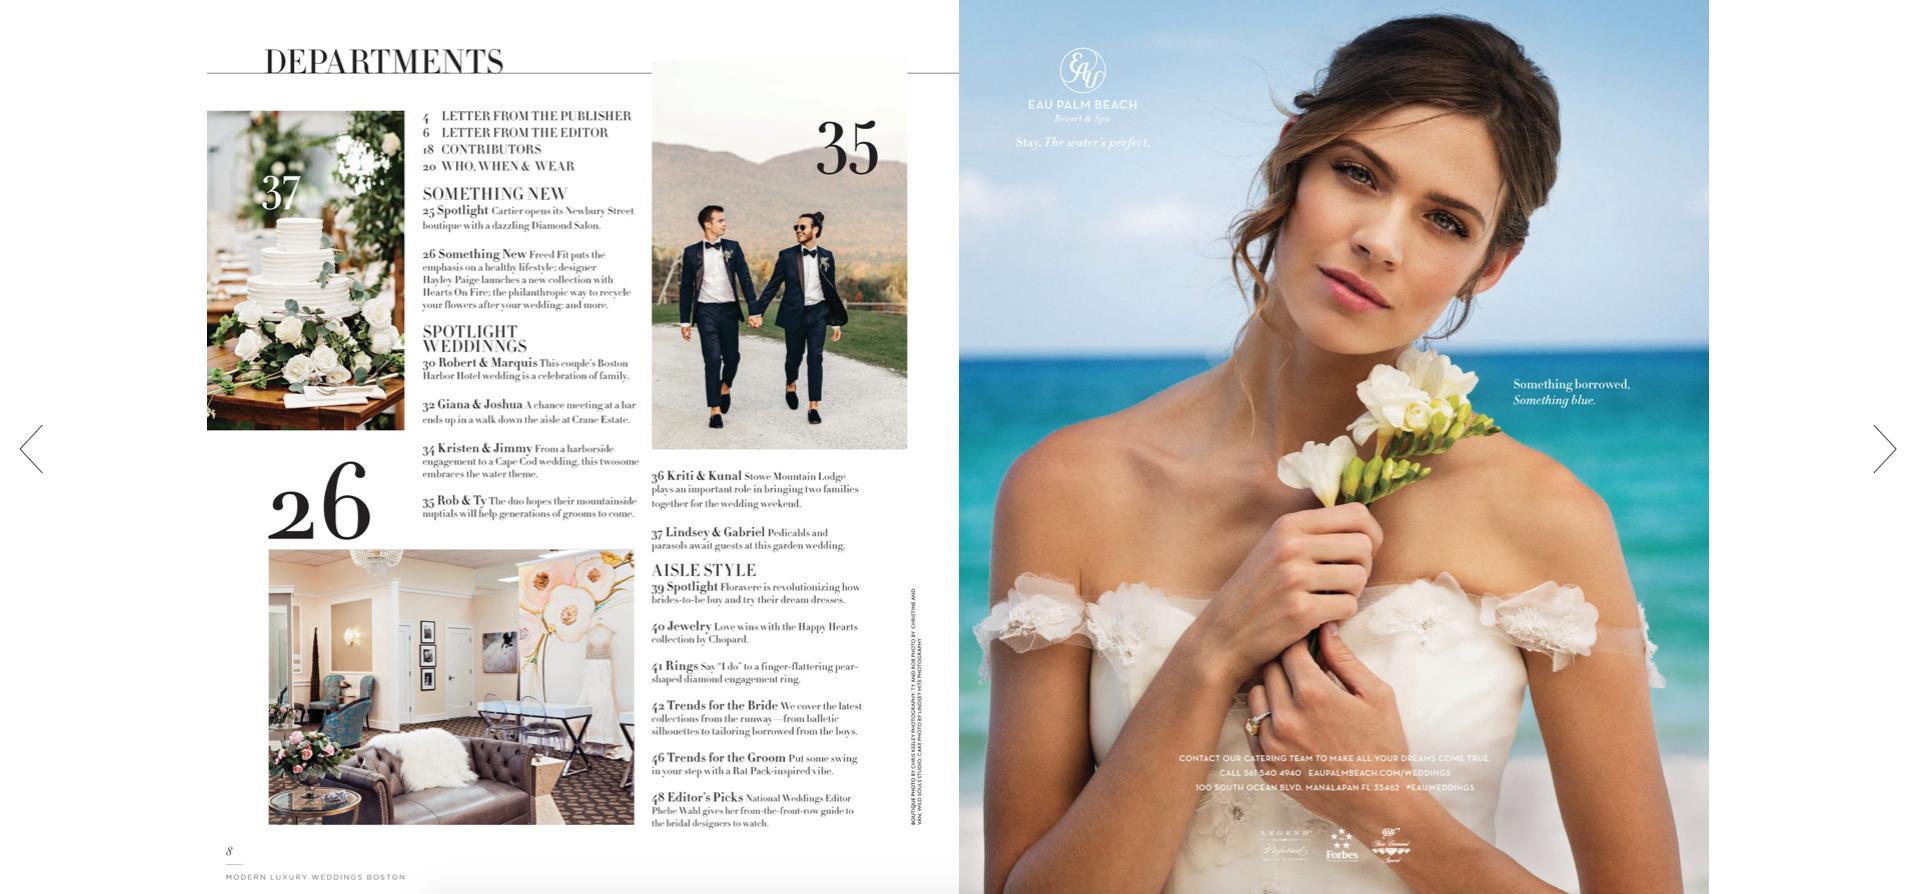 wildsoulsstudio-boston wedding magazine-3.png